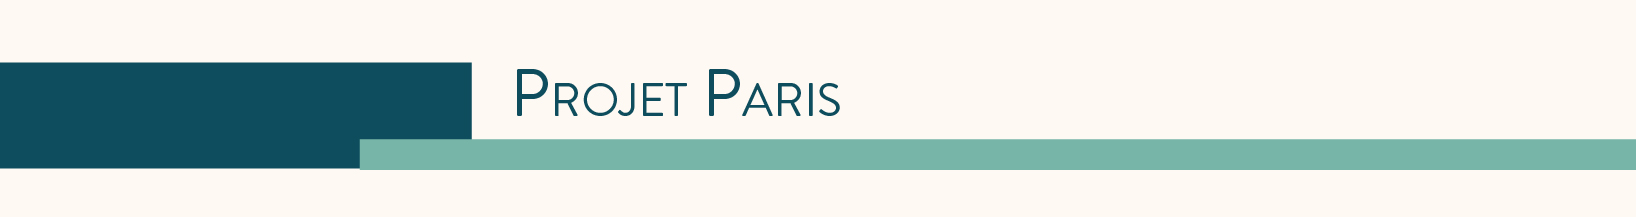 Projet-Paris